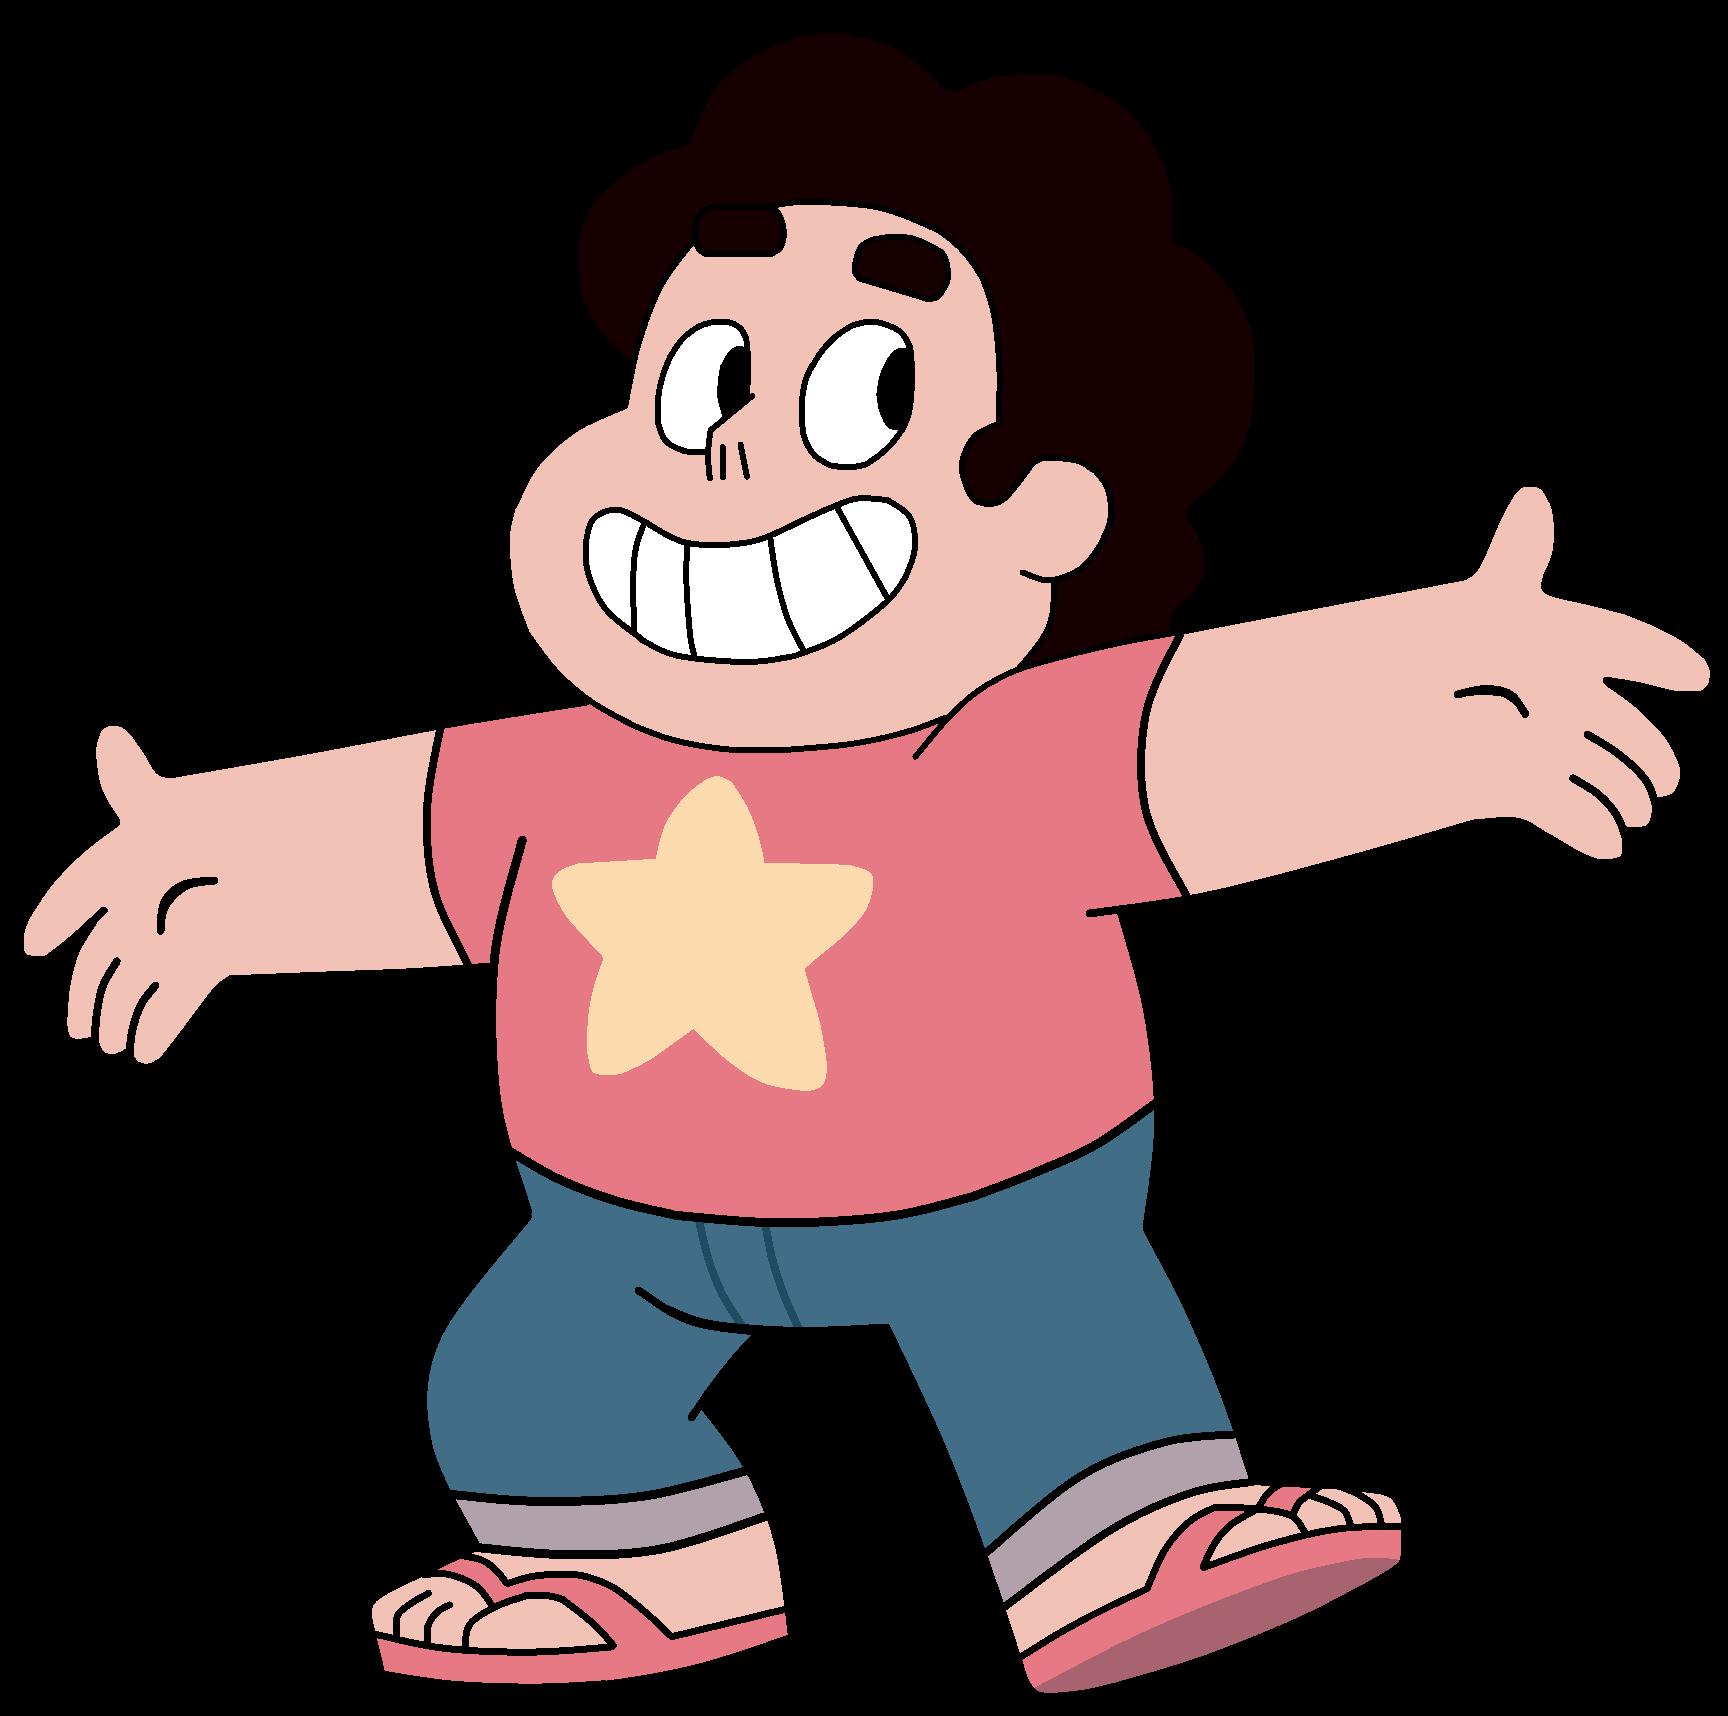 Tiedosto:Steven Universe.png